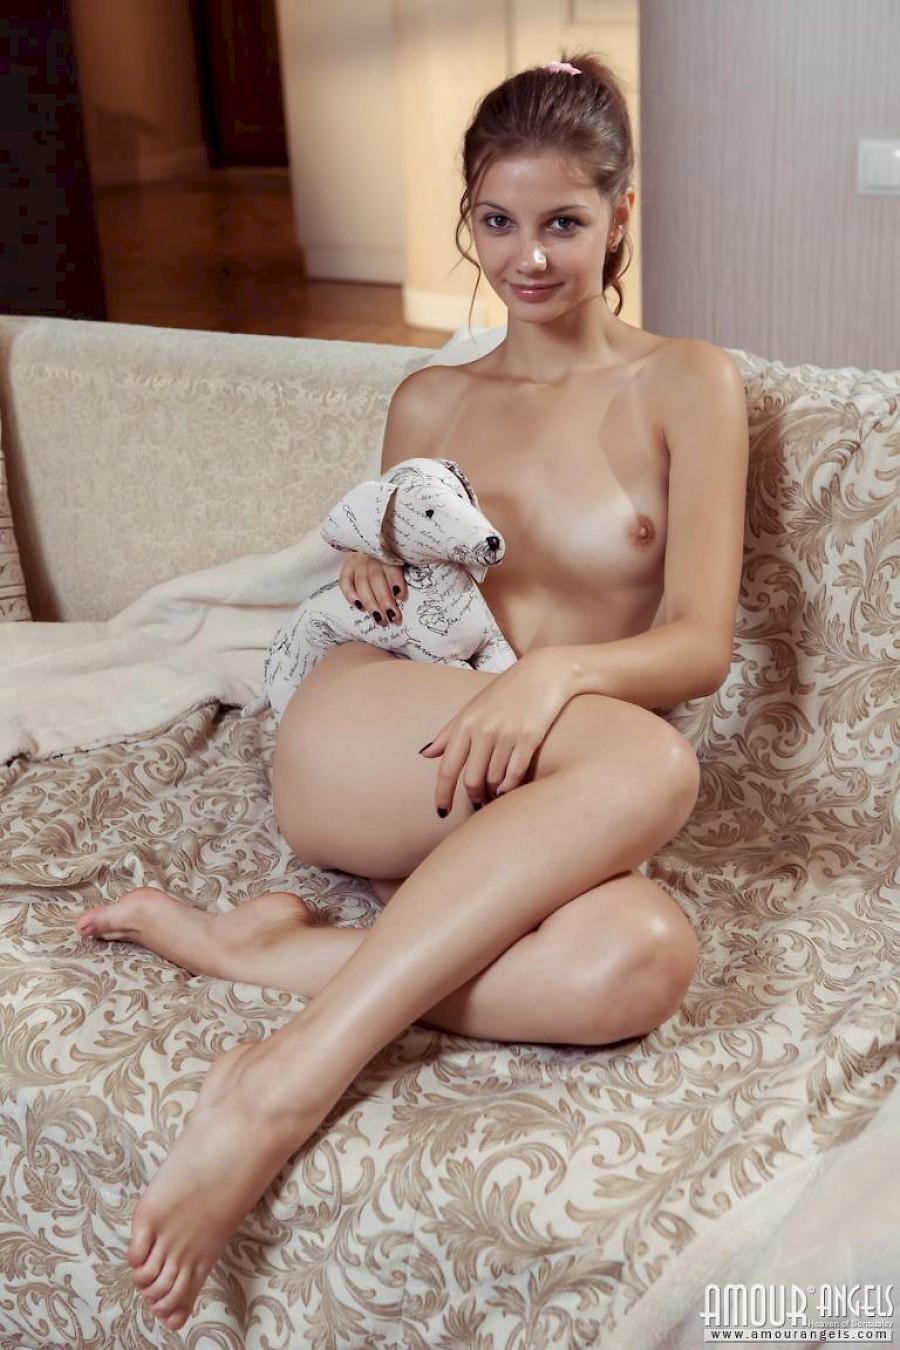 lsbar.jpg4.us emma_watson naked lsbar.jpg4.us www.pretty-virgins nude pornYoung generation nudist 3